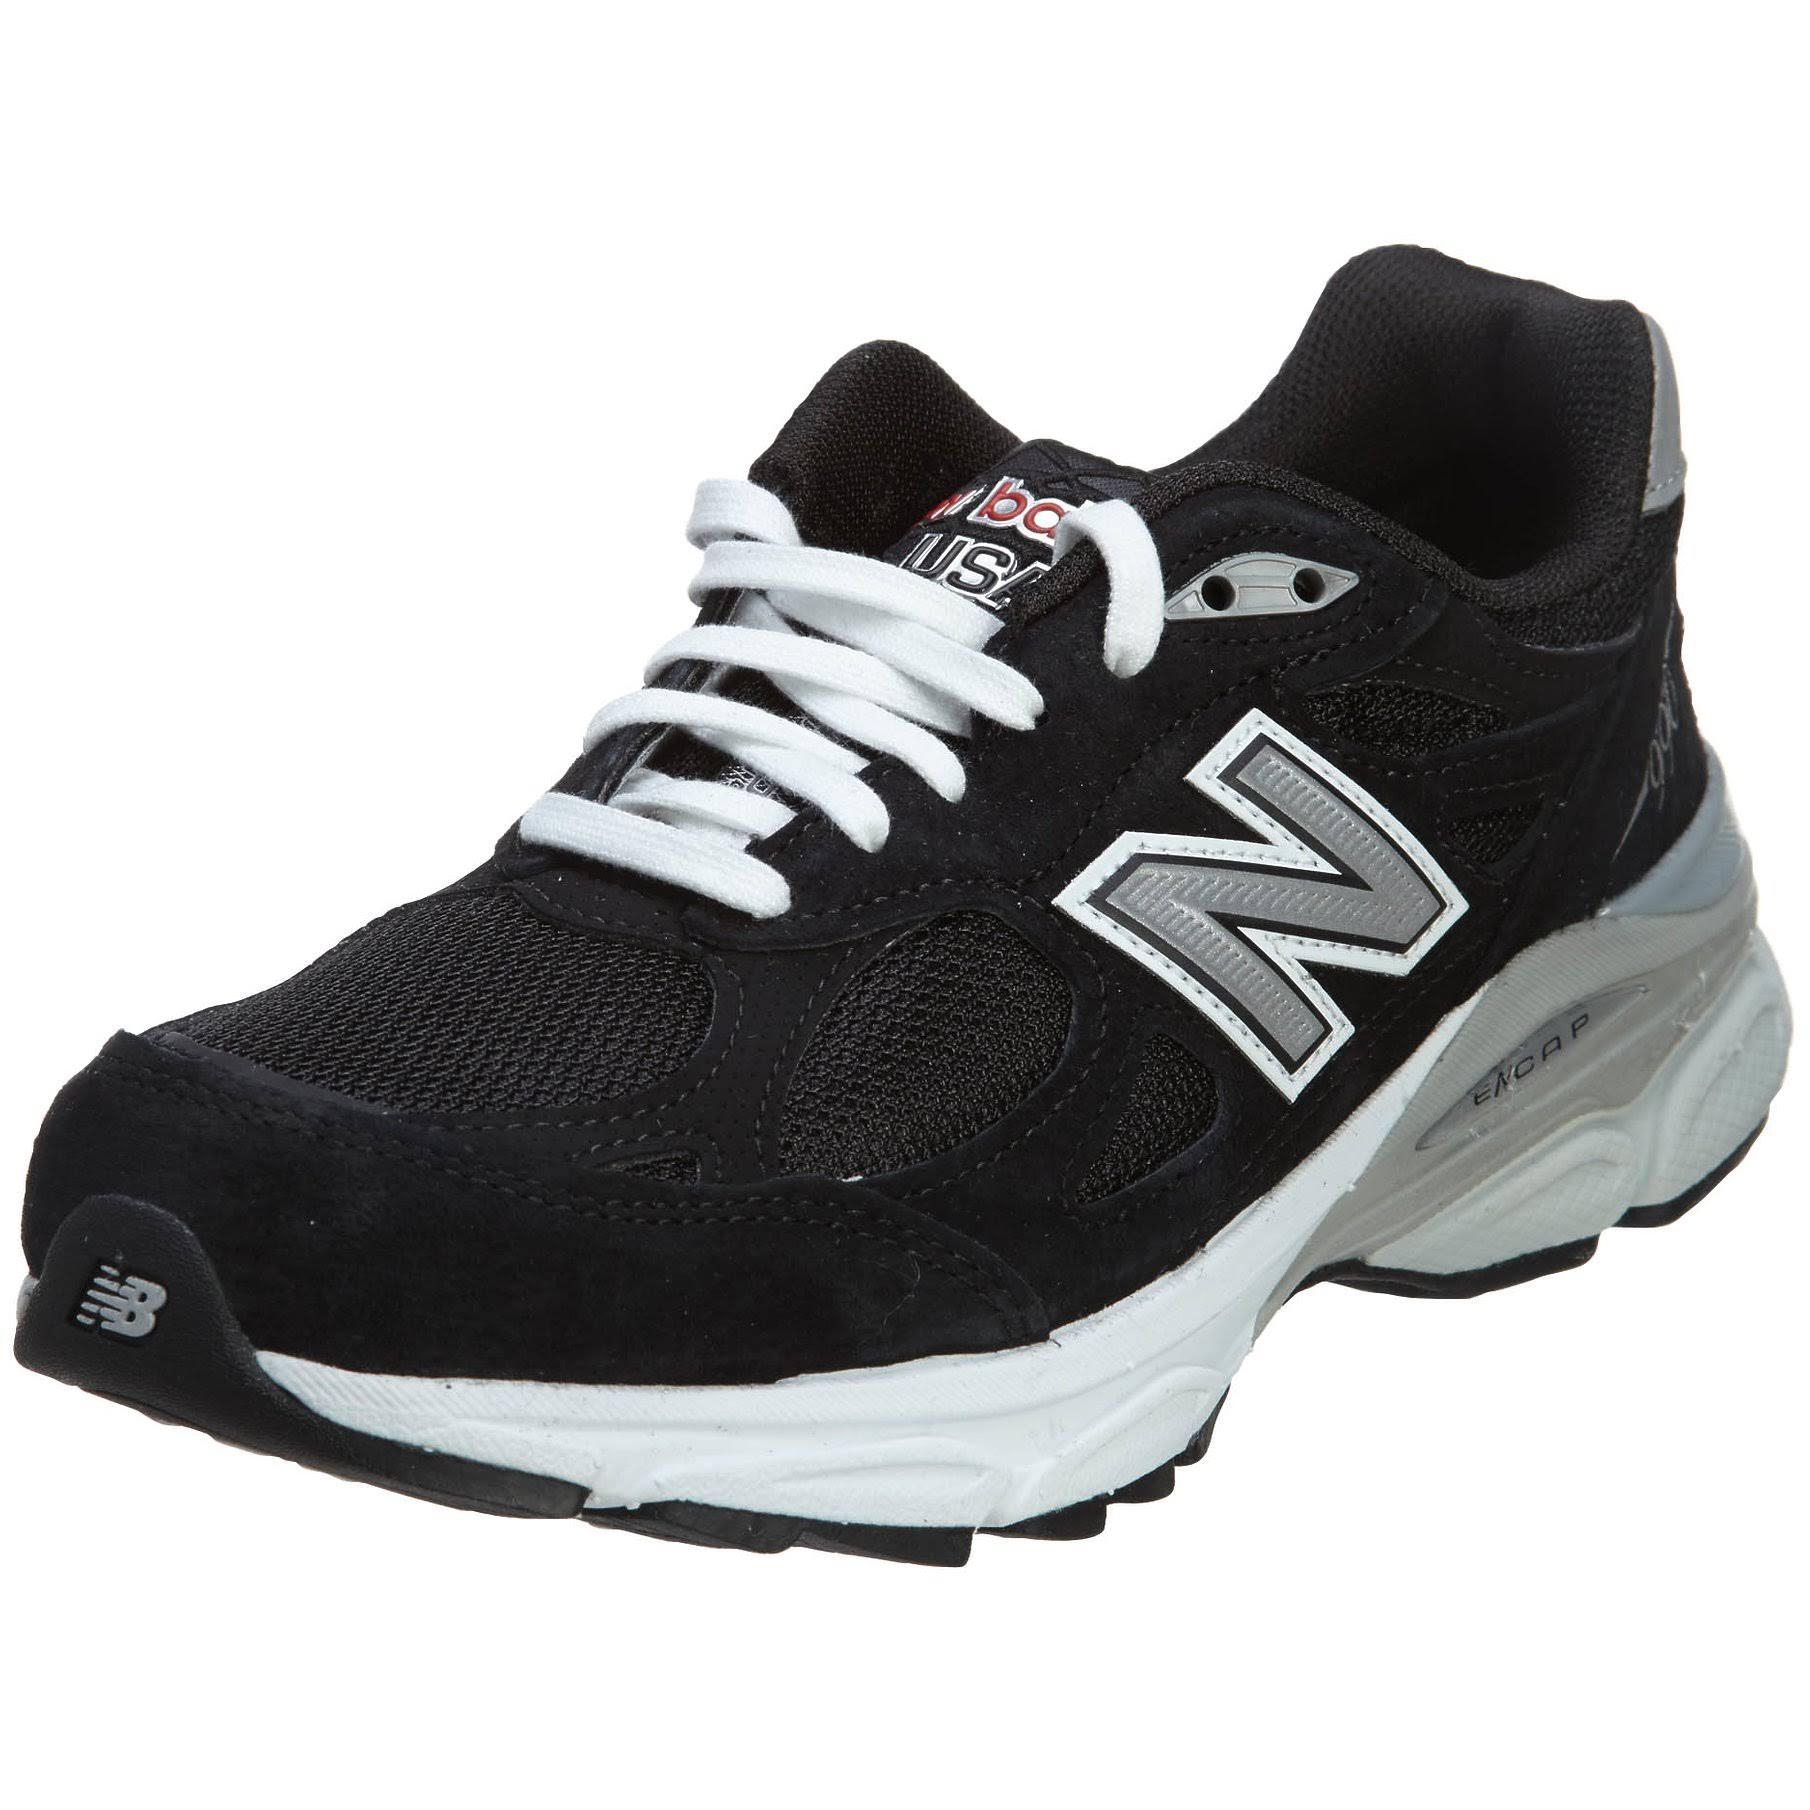 Mujer Para 5 Negro Zapatillas W990bk3 Balance Running New De Plateado 5 6xFcqwYXa